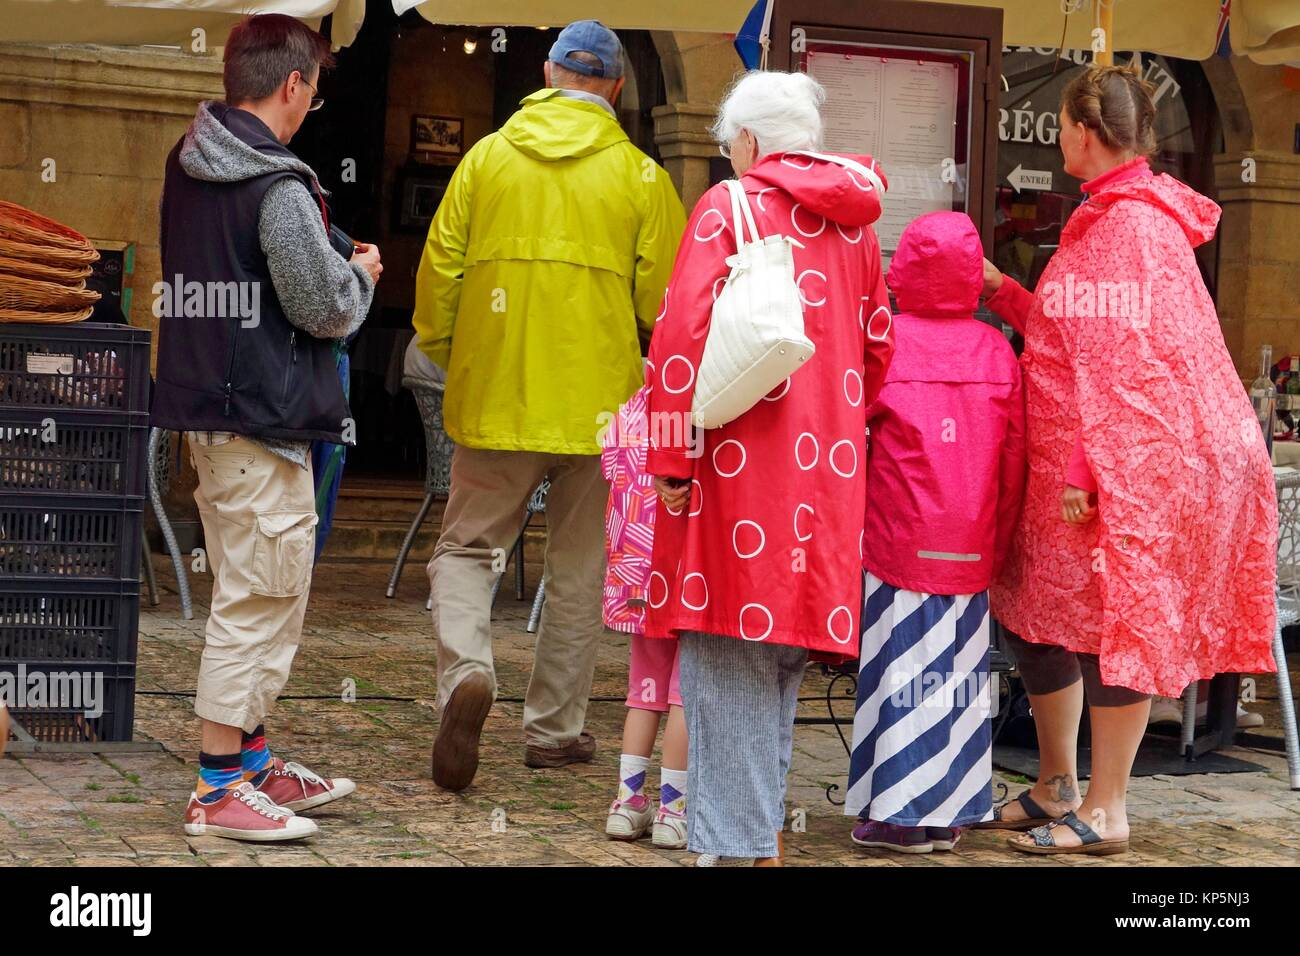 d7e1889d353d11 Käufer tragen bunte Regenmäntel, Sarlat-la-Canéda, Frankreich ...